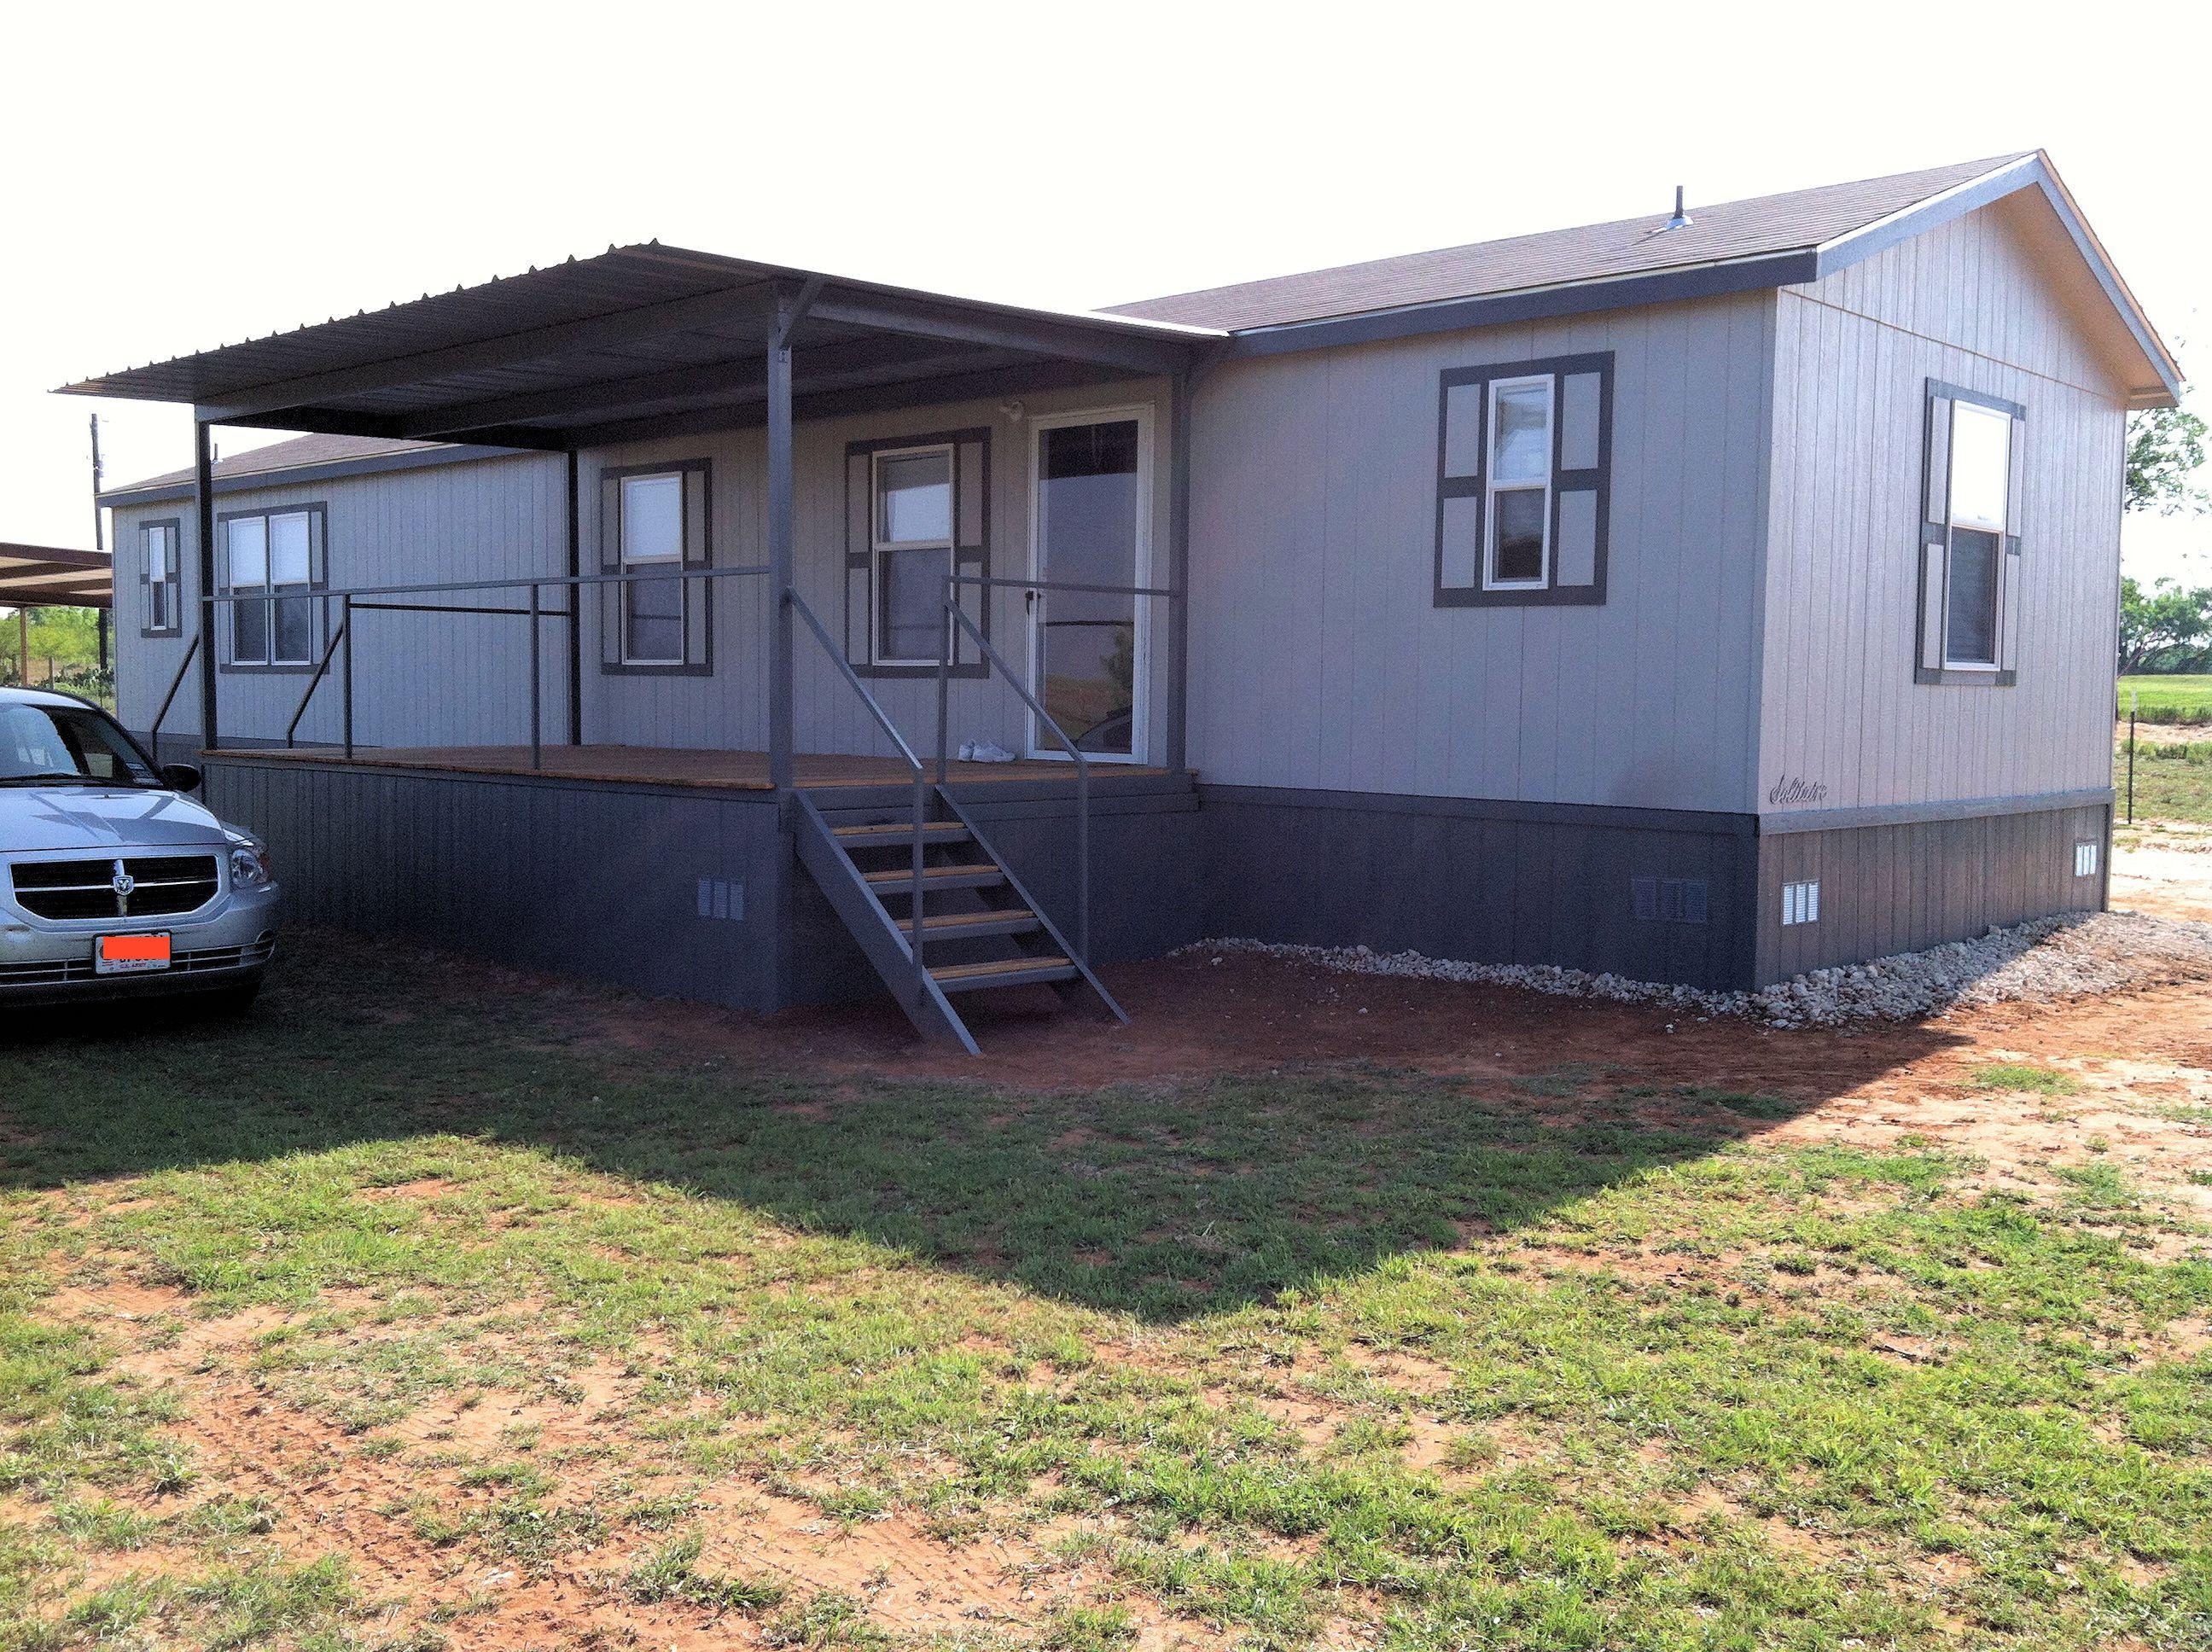 Patio Awning Boerne Tx Installation Carport Patio Covers Awnings San Building A Carport Building A Deck Carport Patio